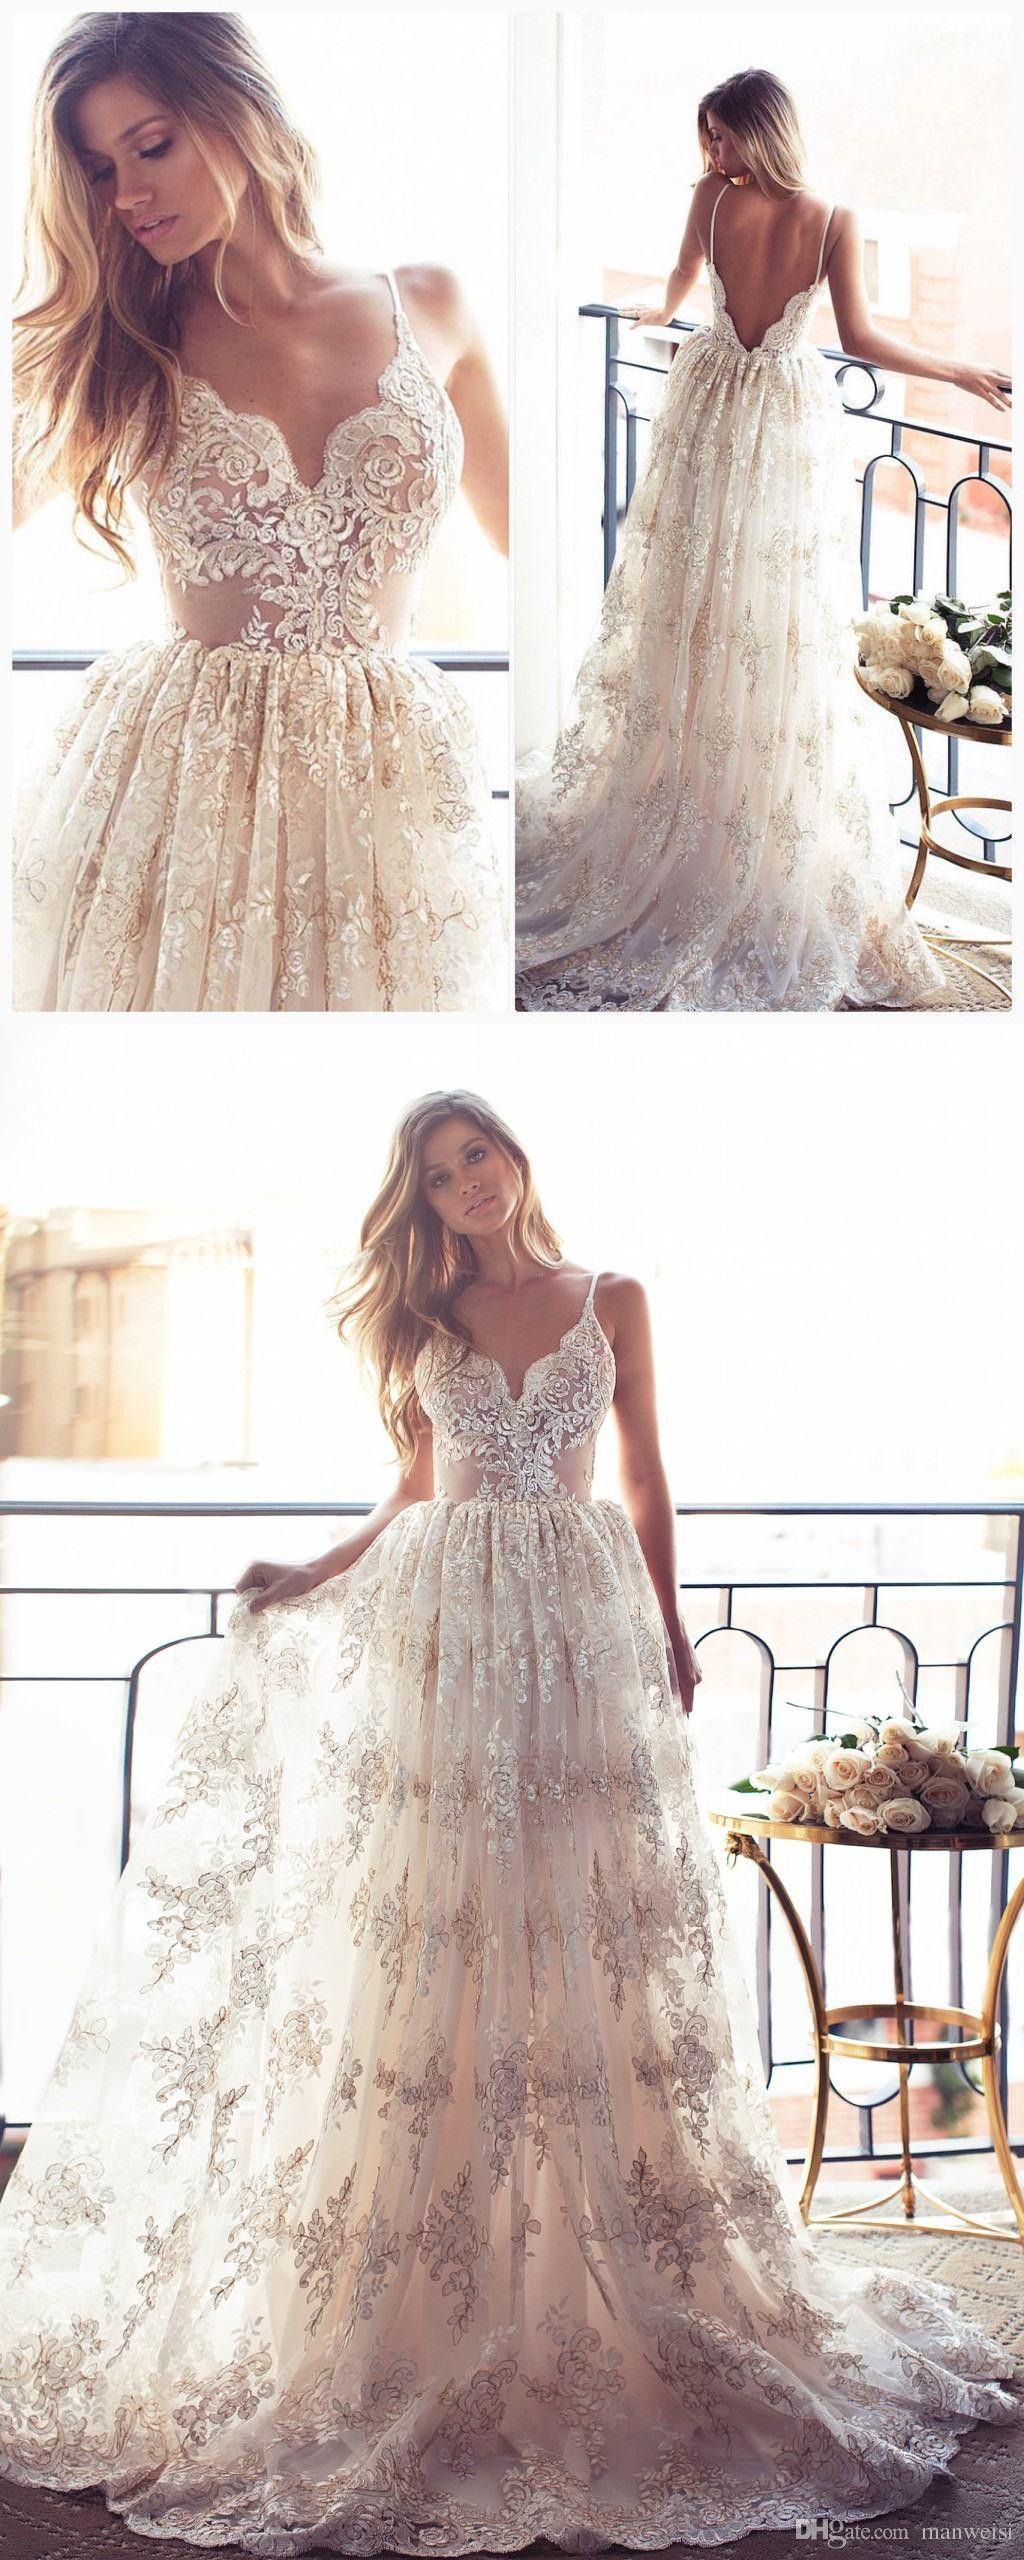 Romantic aline strapless long lace wedding dress from modsele